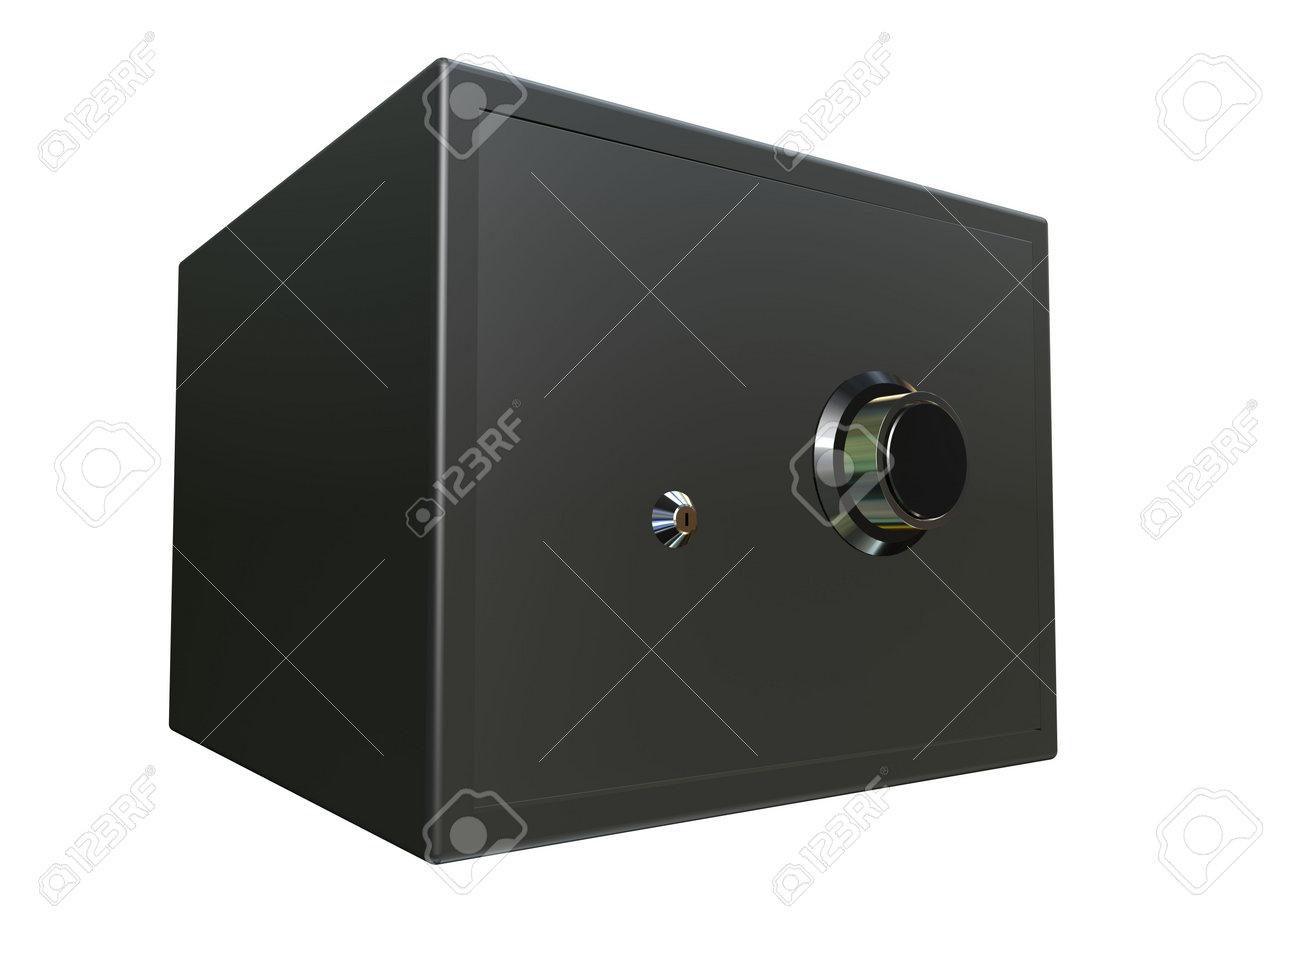 small safe Stock Photo - 705407